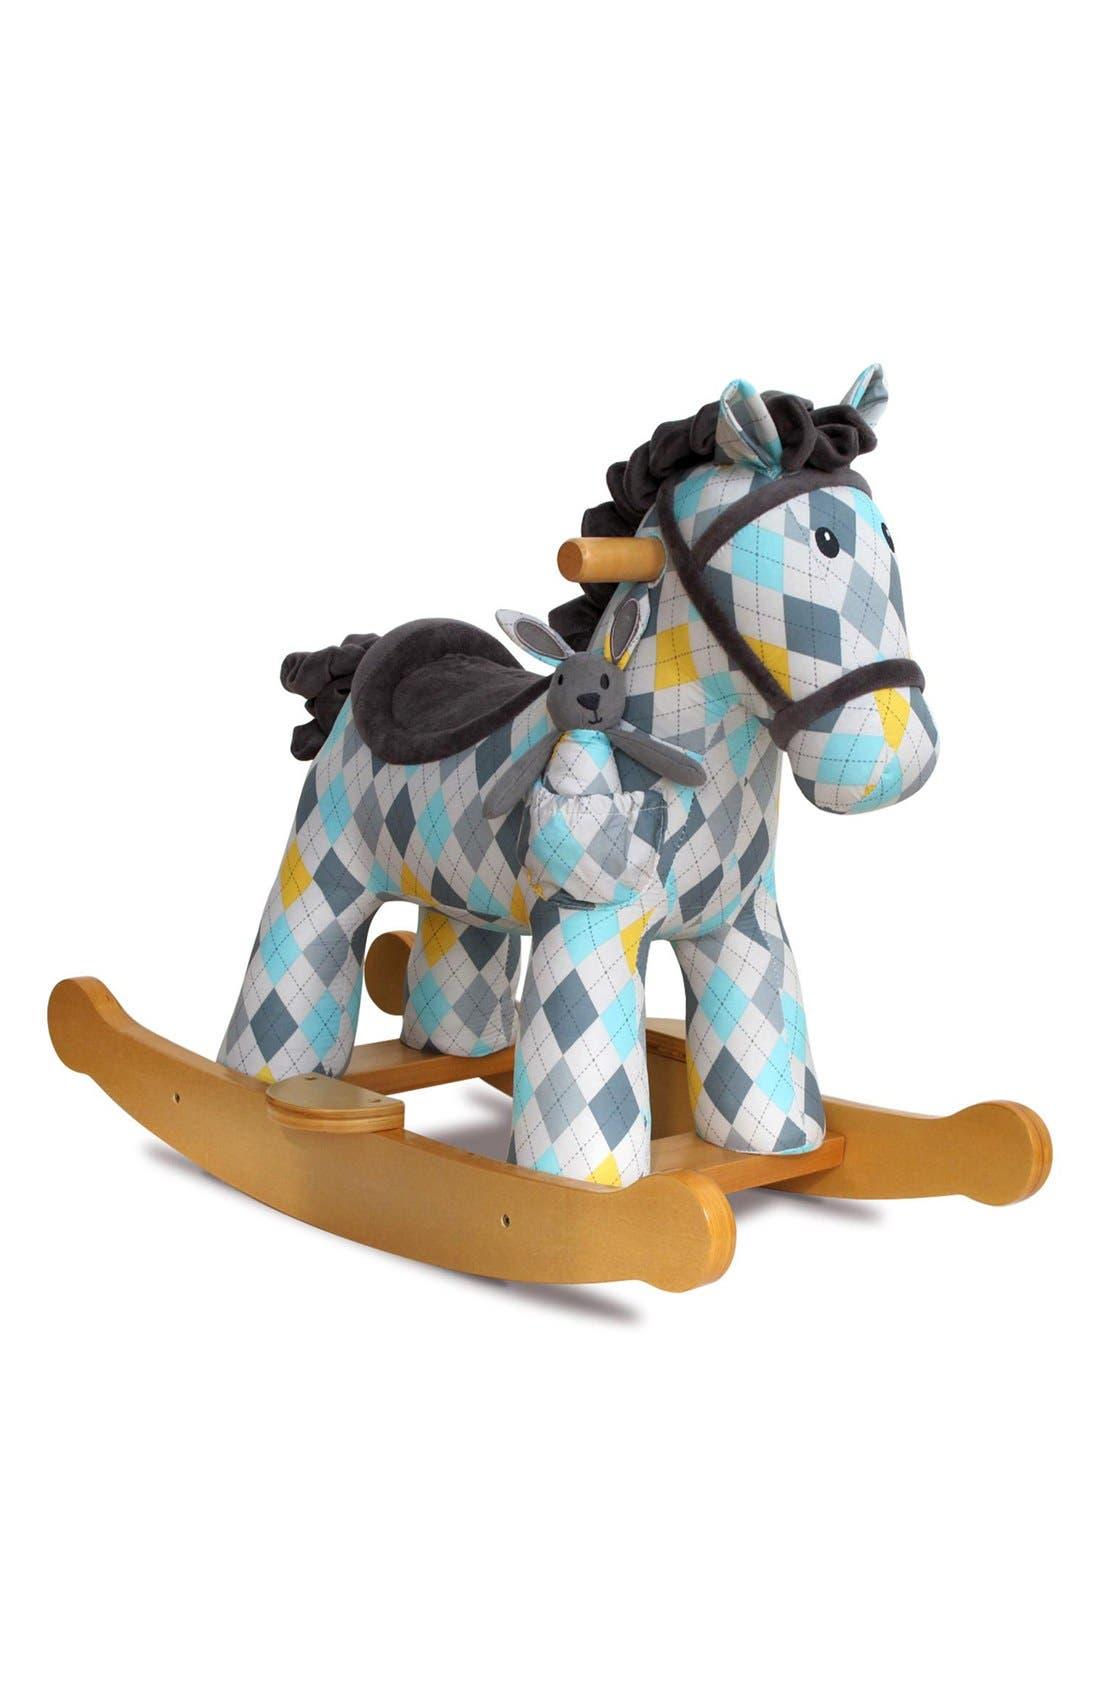 Little Bird Told Me Lewis & Fitz Rocking Horse & Stuffed Animal